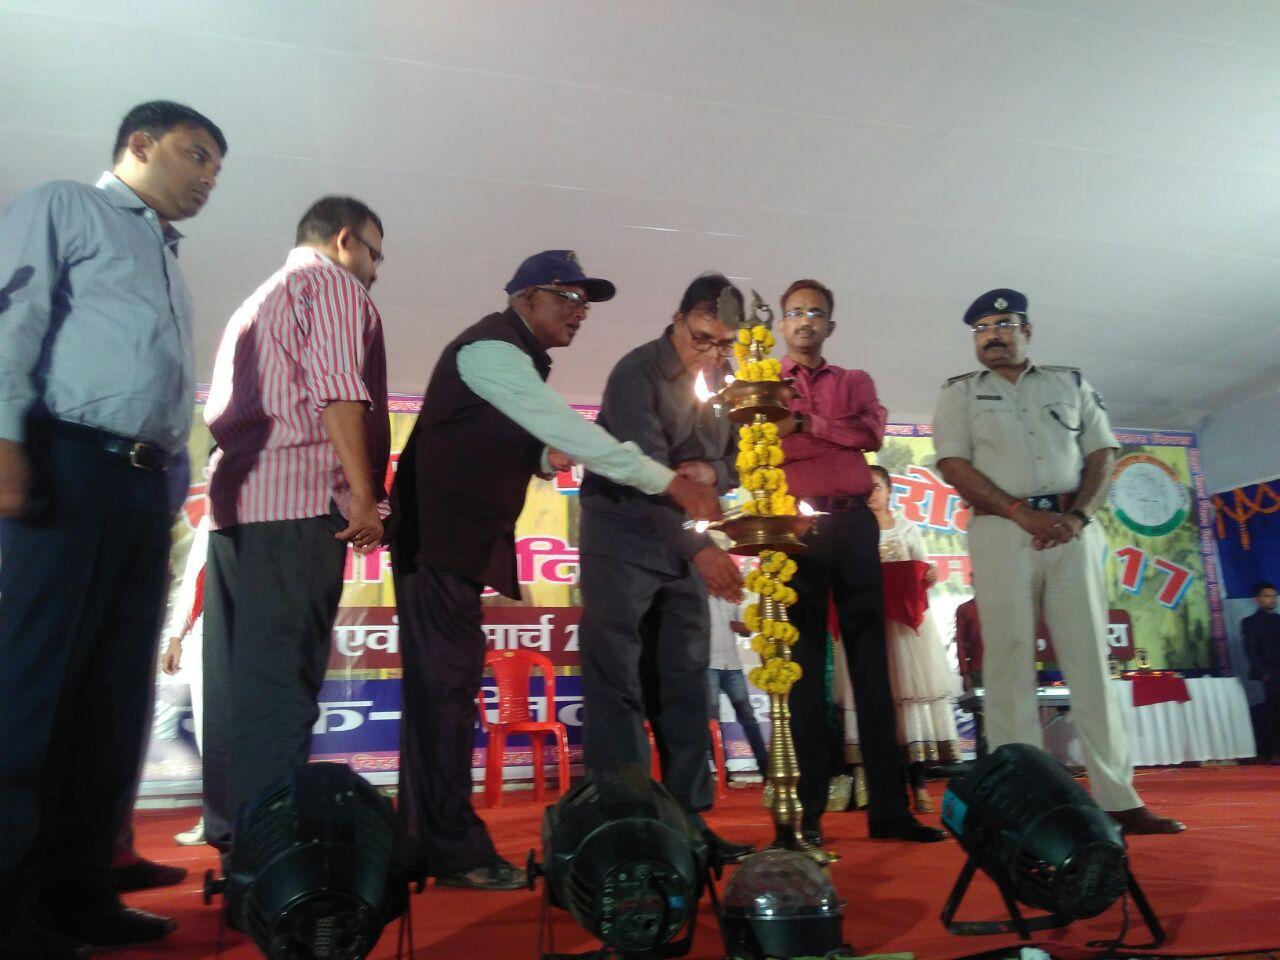 On the auspicious occasion of Bihar-Diwas  Samajsevi Dr.Bhupendra Madhepuri lighting the inaugural lamp in the graceful presence of DM Md.Sohail  (IAS), SP Vikas Kumar  (IPS), SDM Sanjay Kumar Nirala and the people of Madhepura at BN Mandal Stadium.